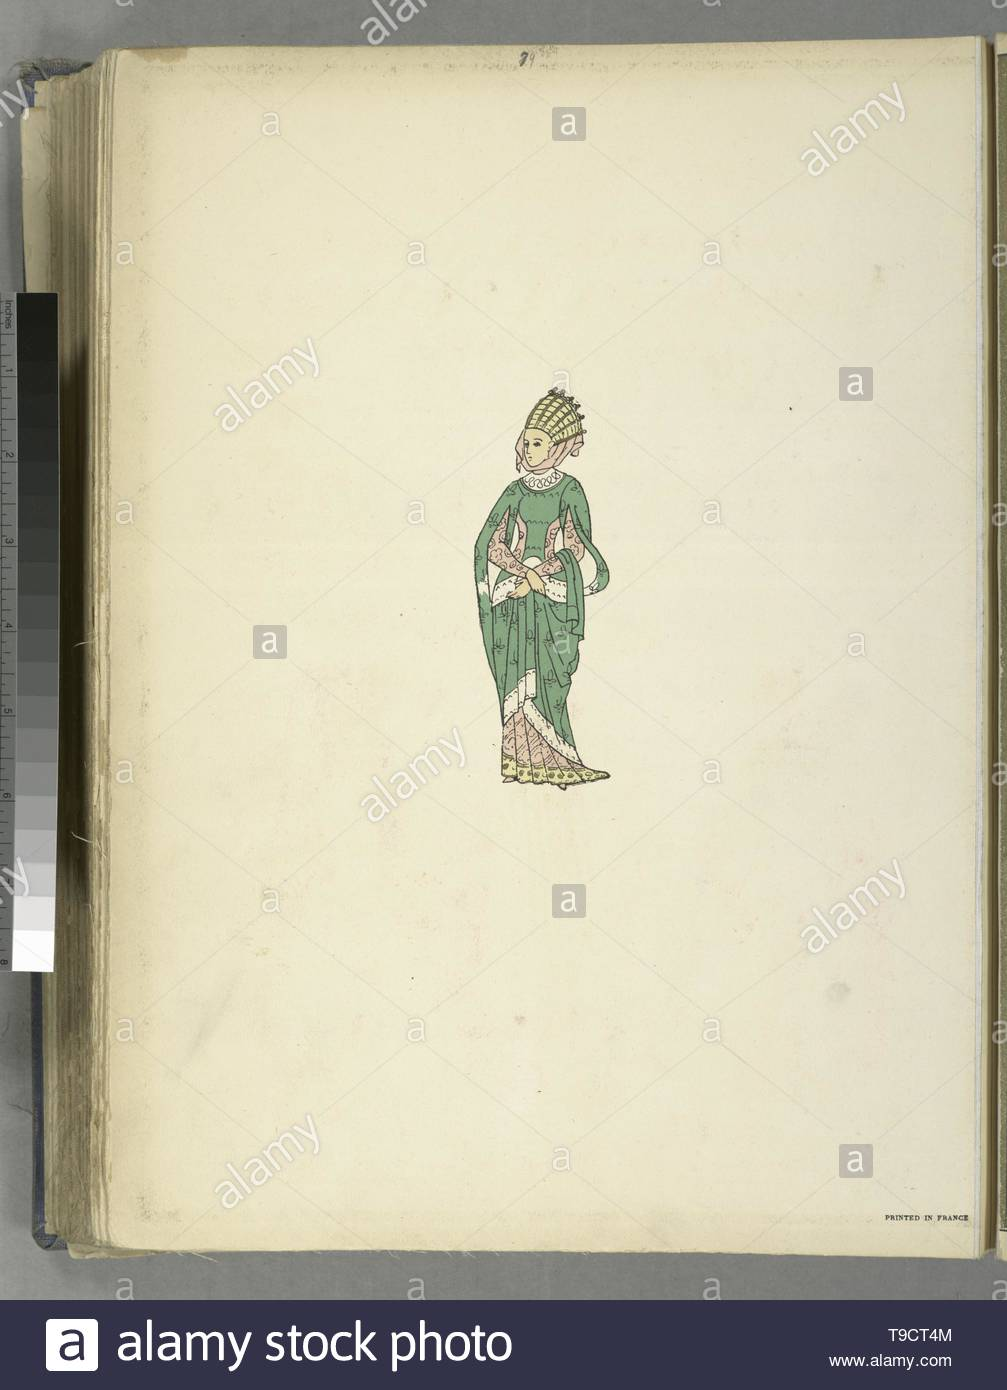 Giafferri,PaulLouisde,b 1886-Woman in green gown with headdress - Stock Image